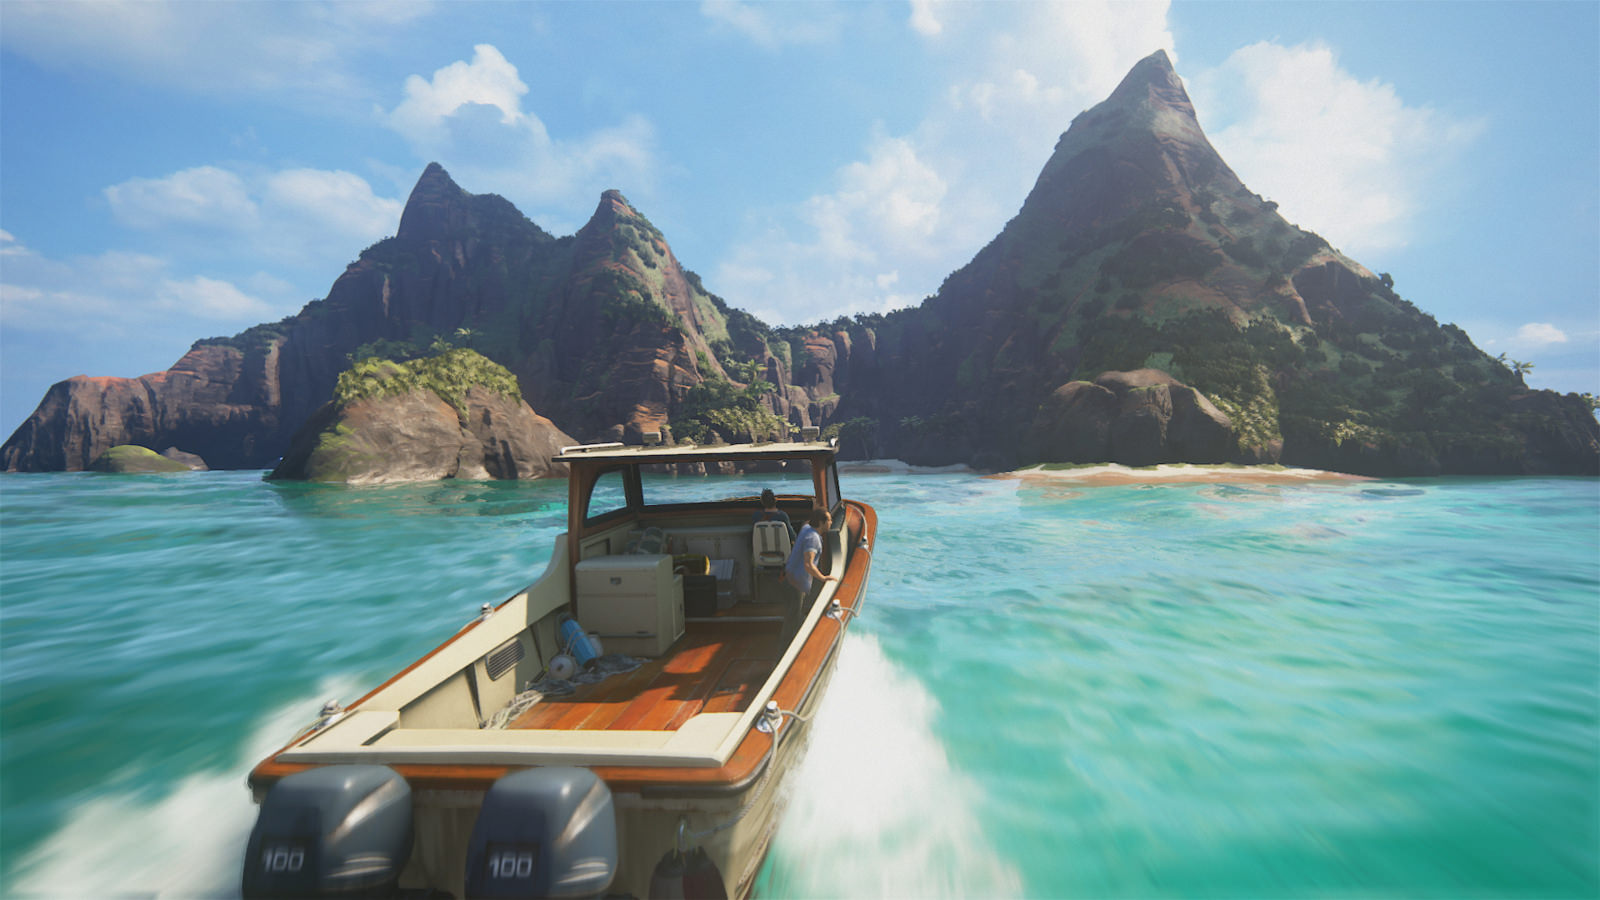 Uncharted4-AThief-sEnd PS4 Editeur 075